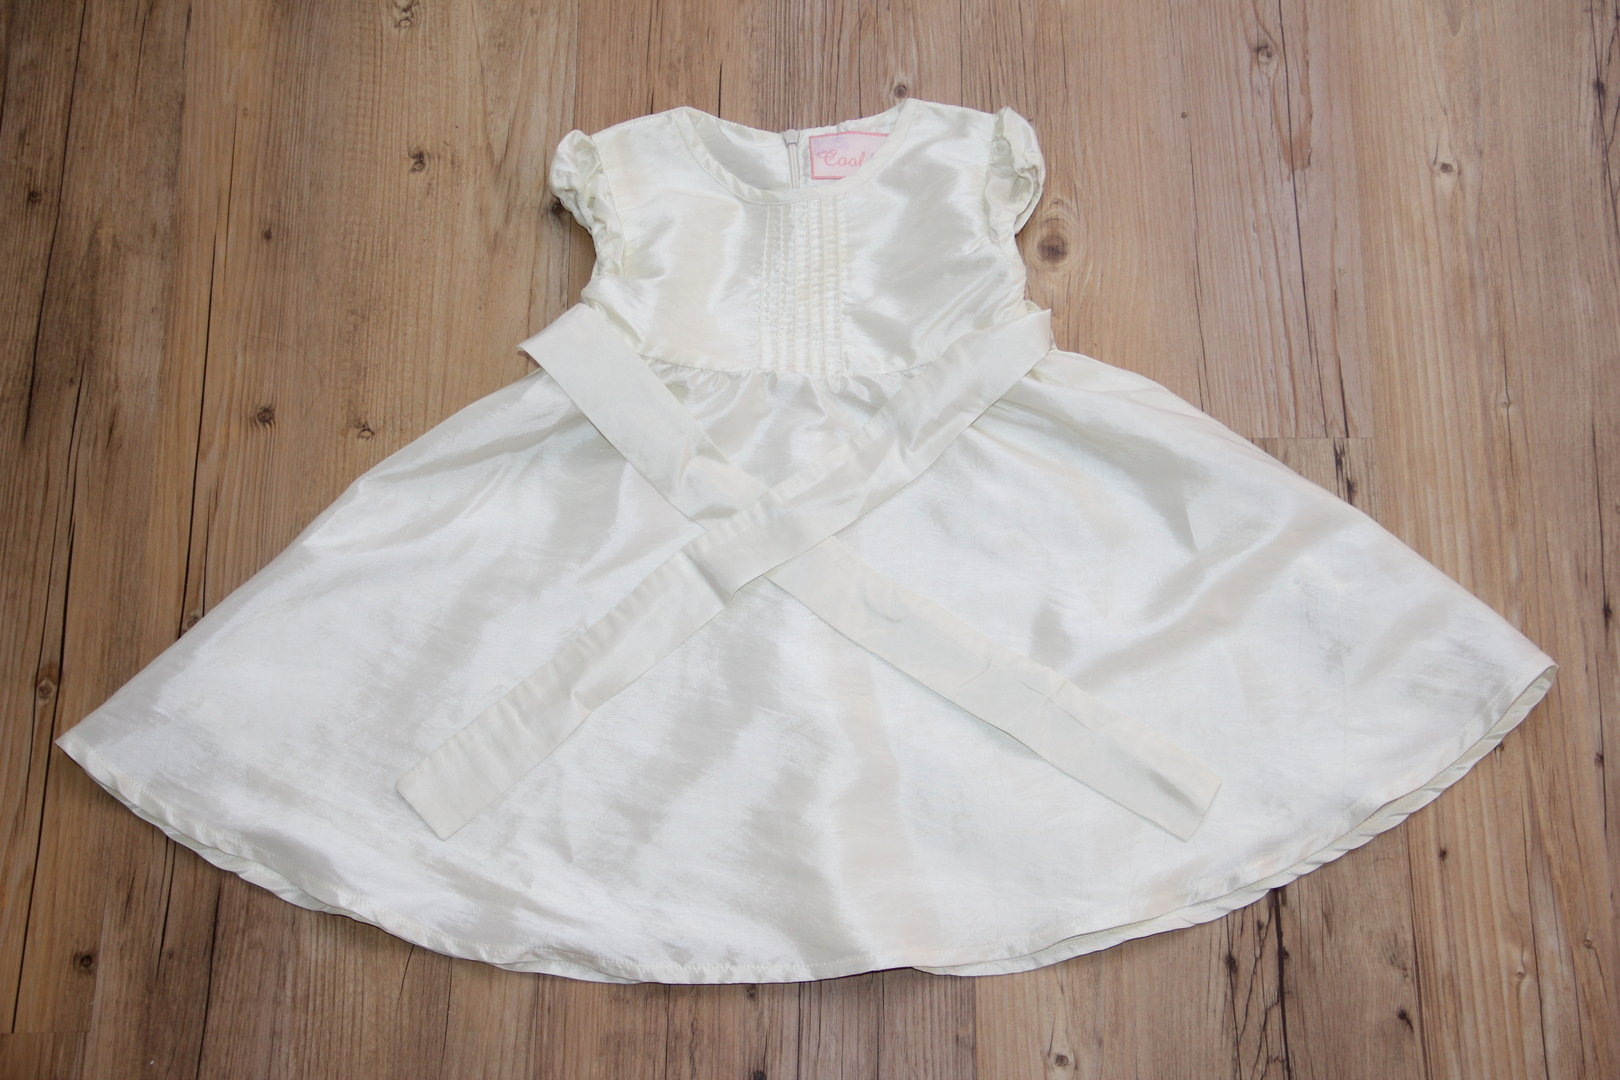 cremefarbenes Kleid - Coolclub - Gr. 18